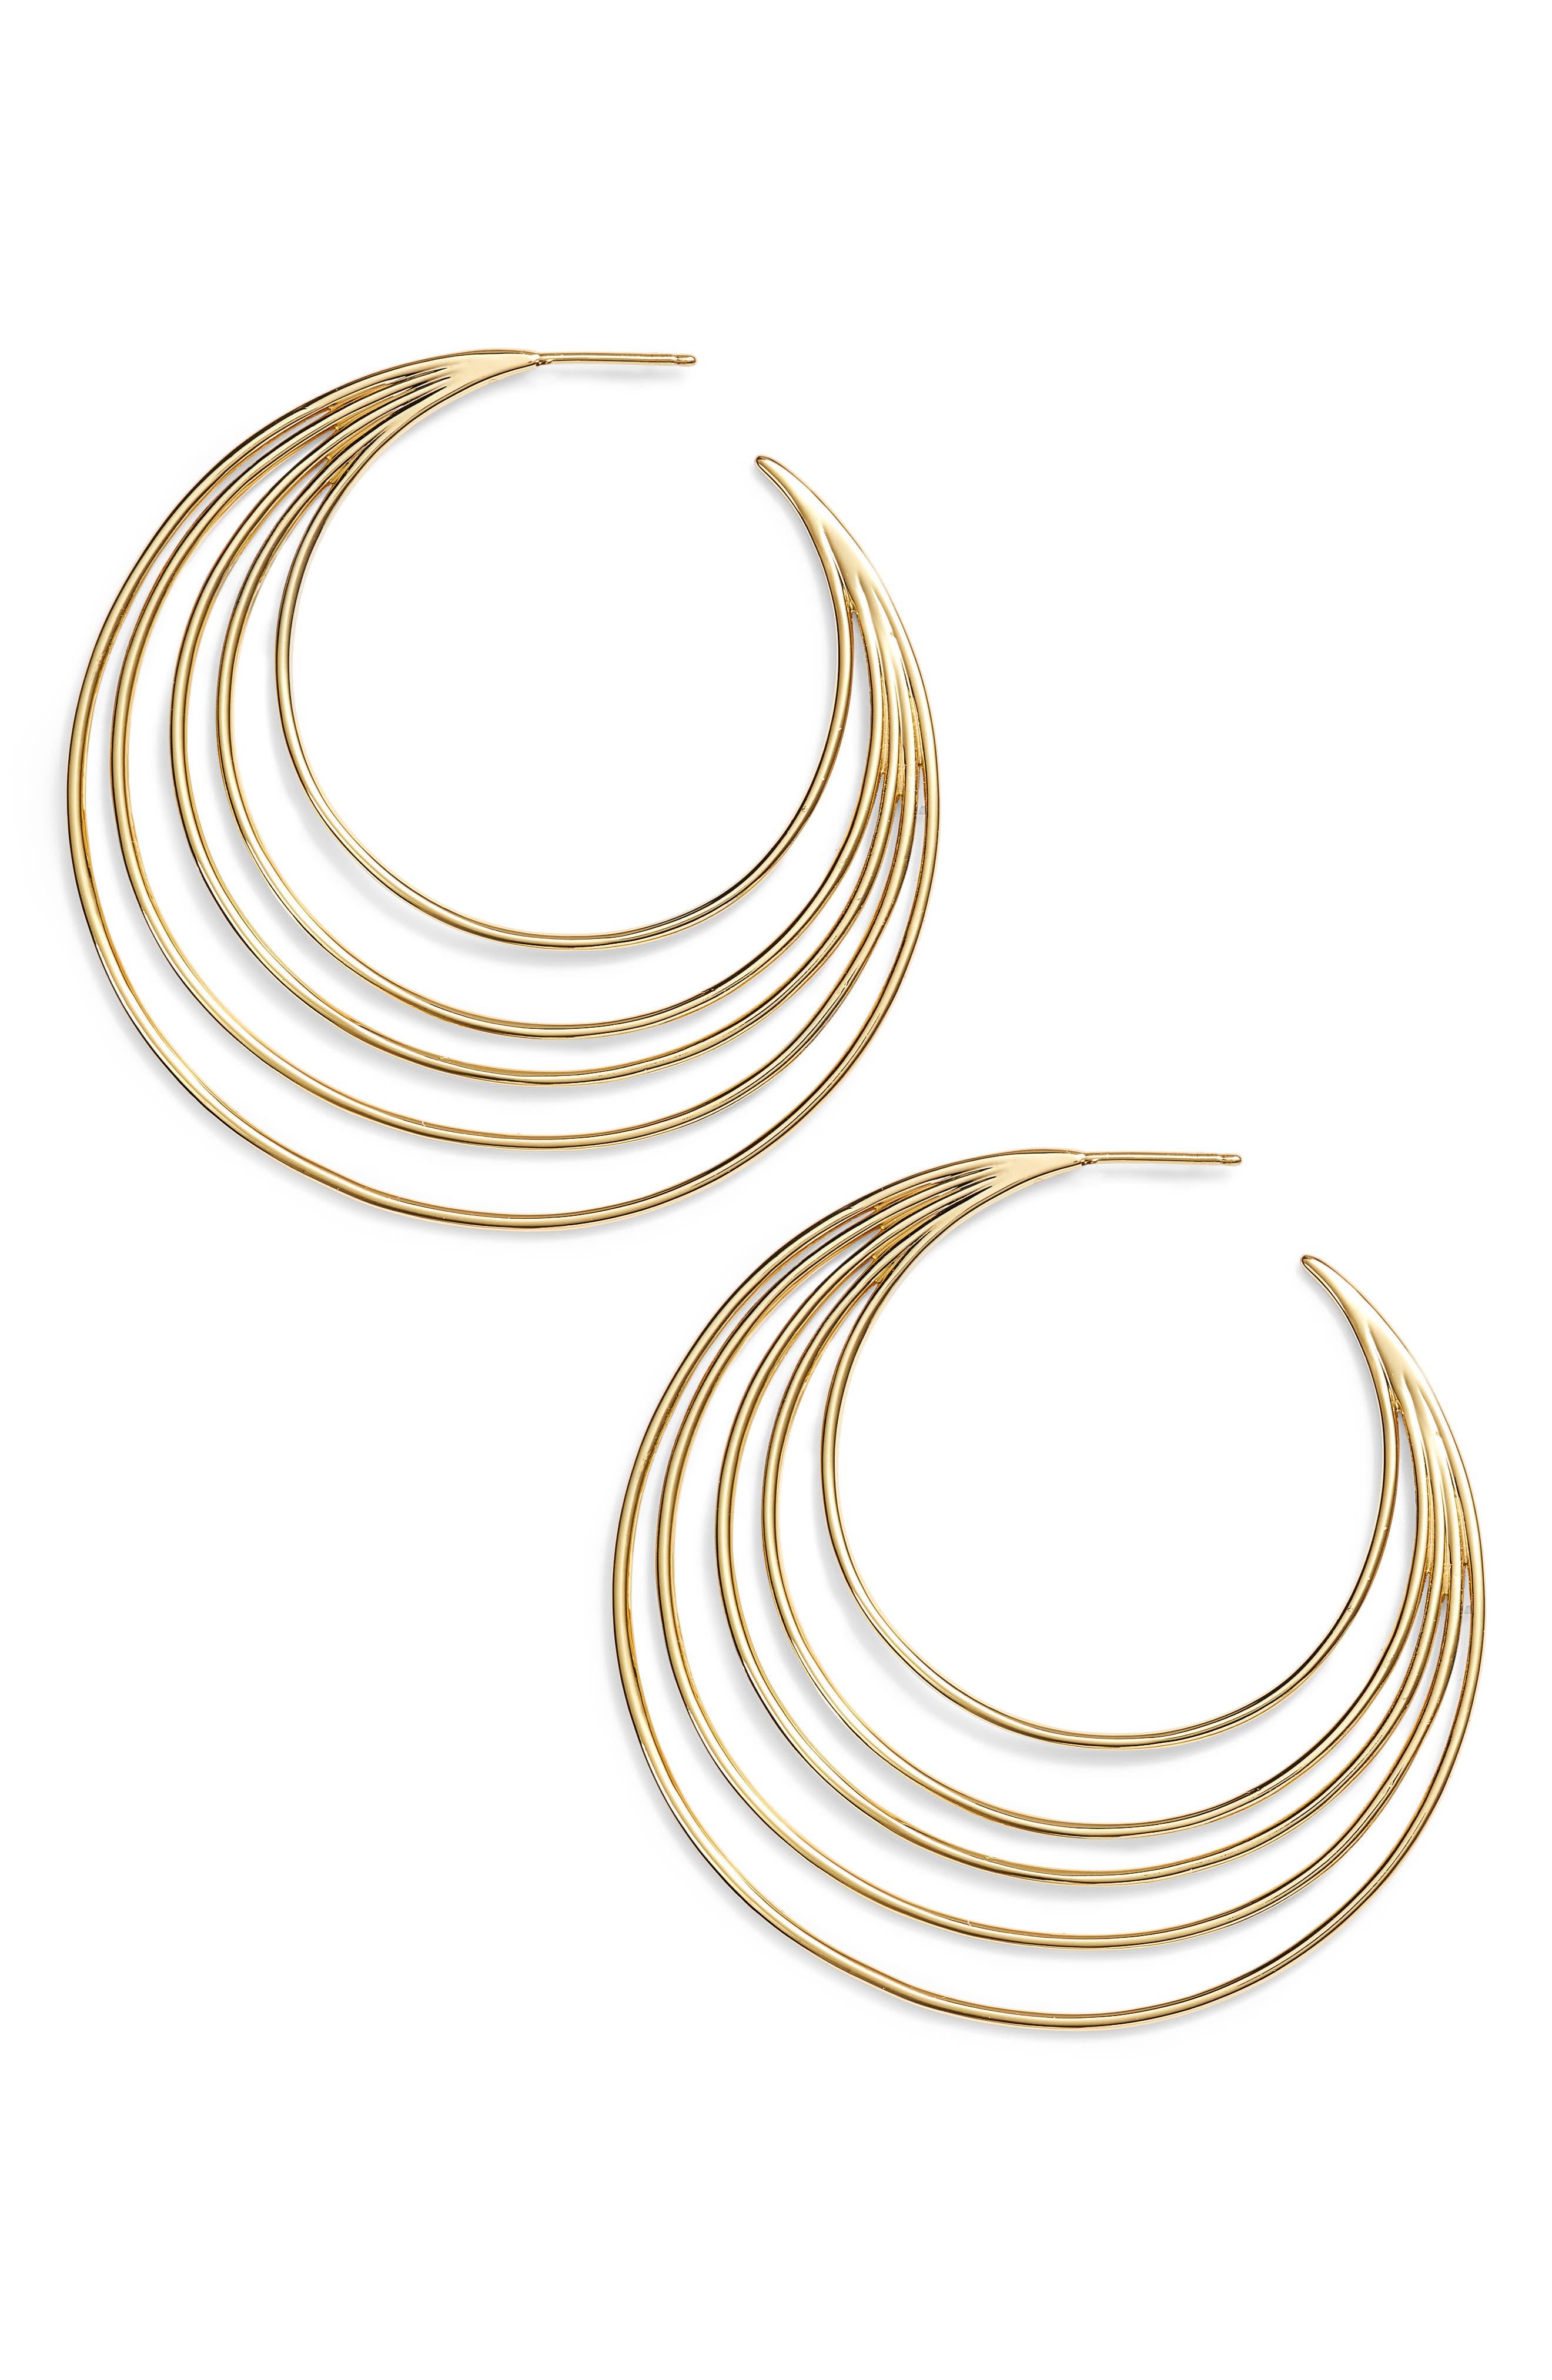 Casey Profile Hoop Earrings,                         Main,                         color, 710